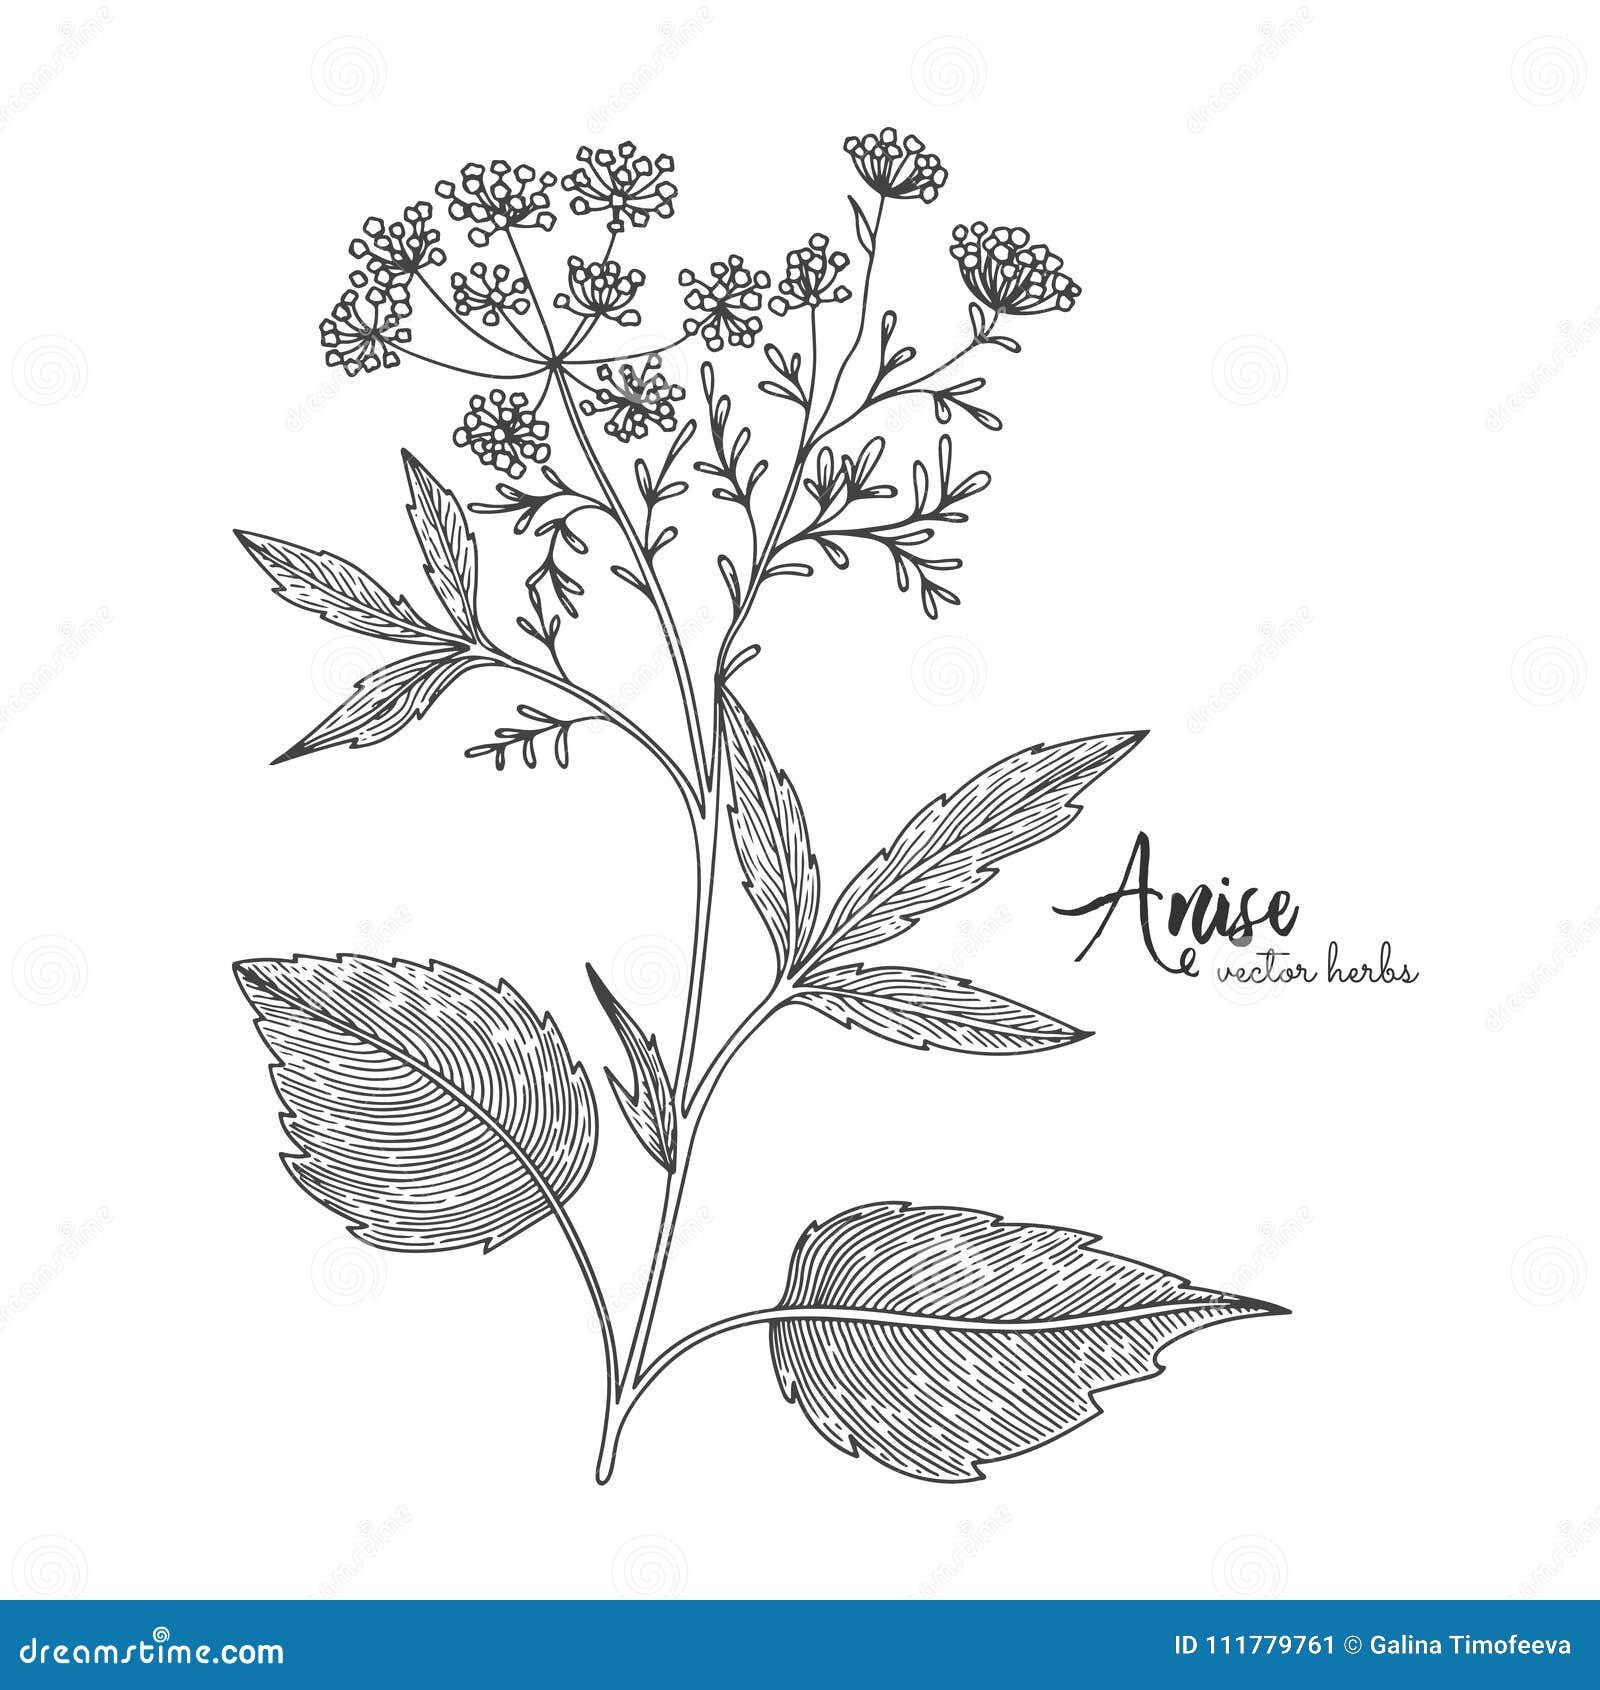 Anise isolated on white background. Herbal engraved style illustration. Detailed organic product sketch. Botanical hand